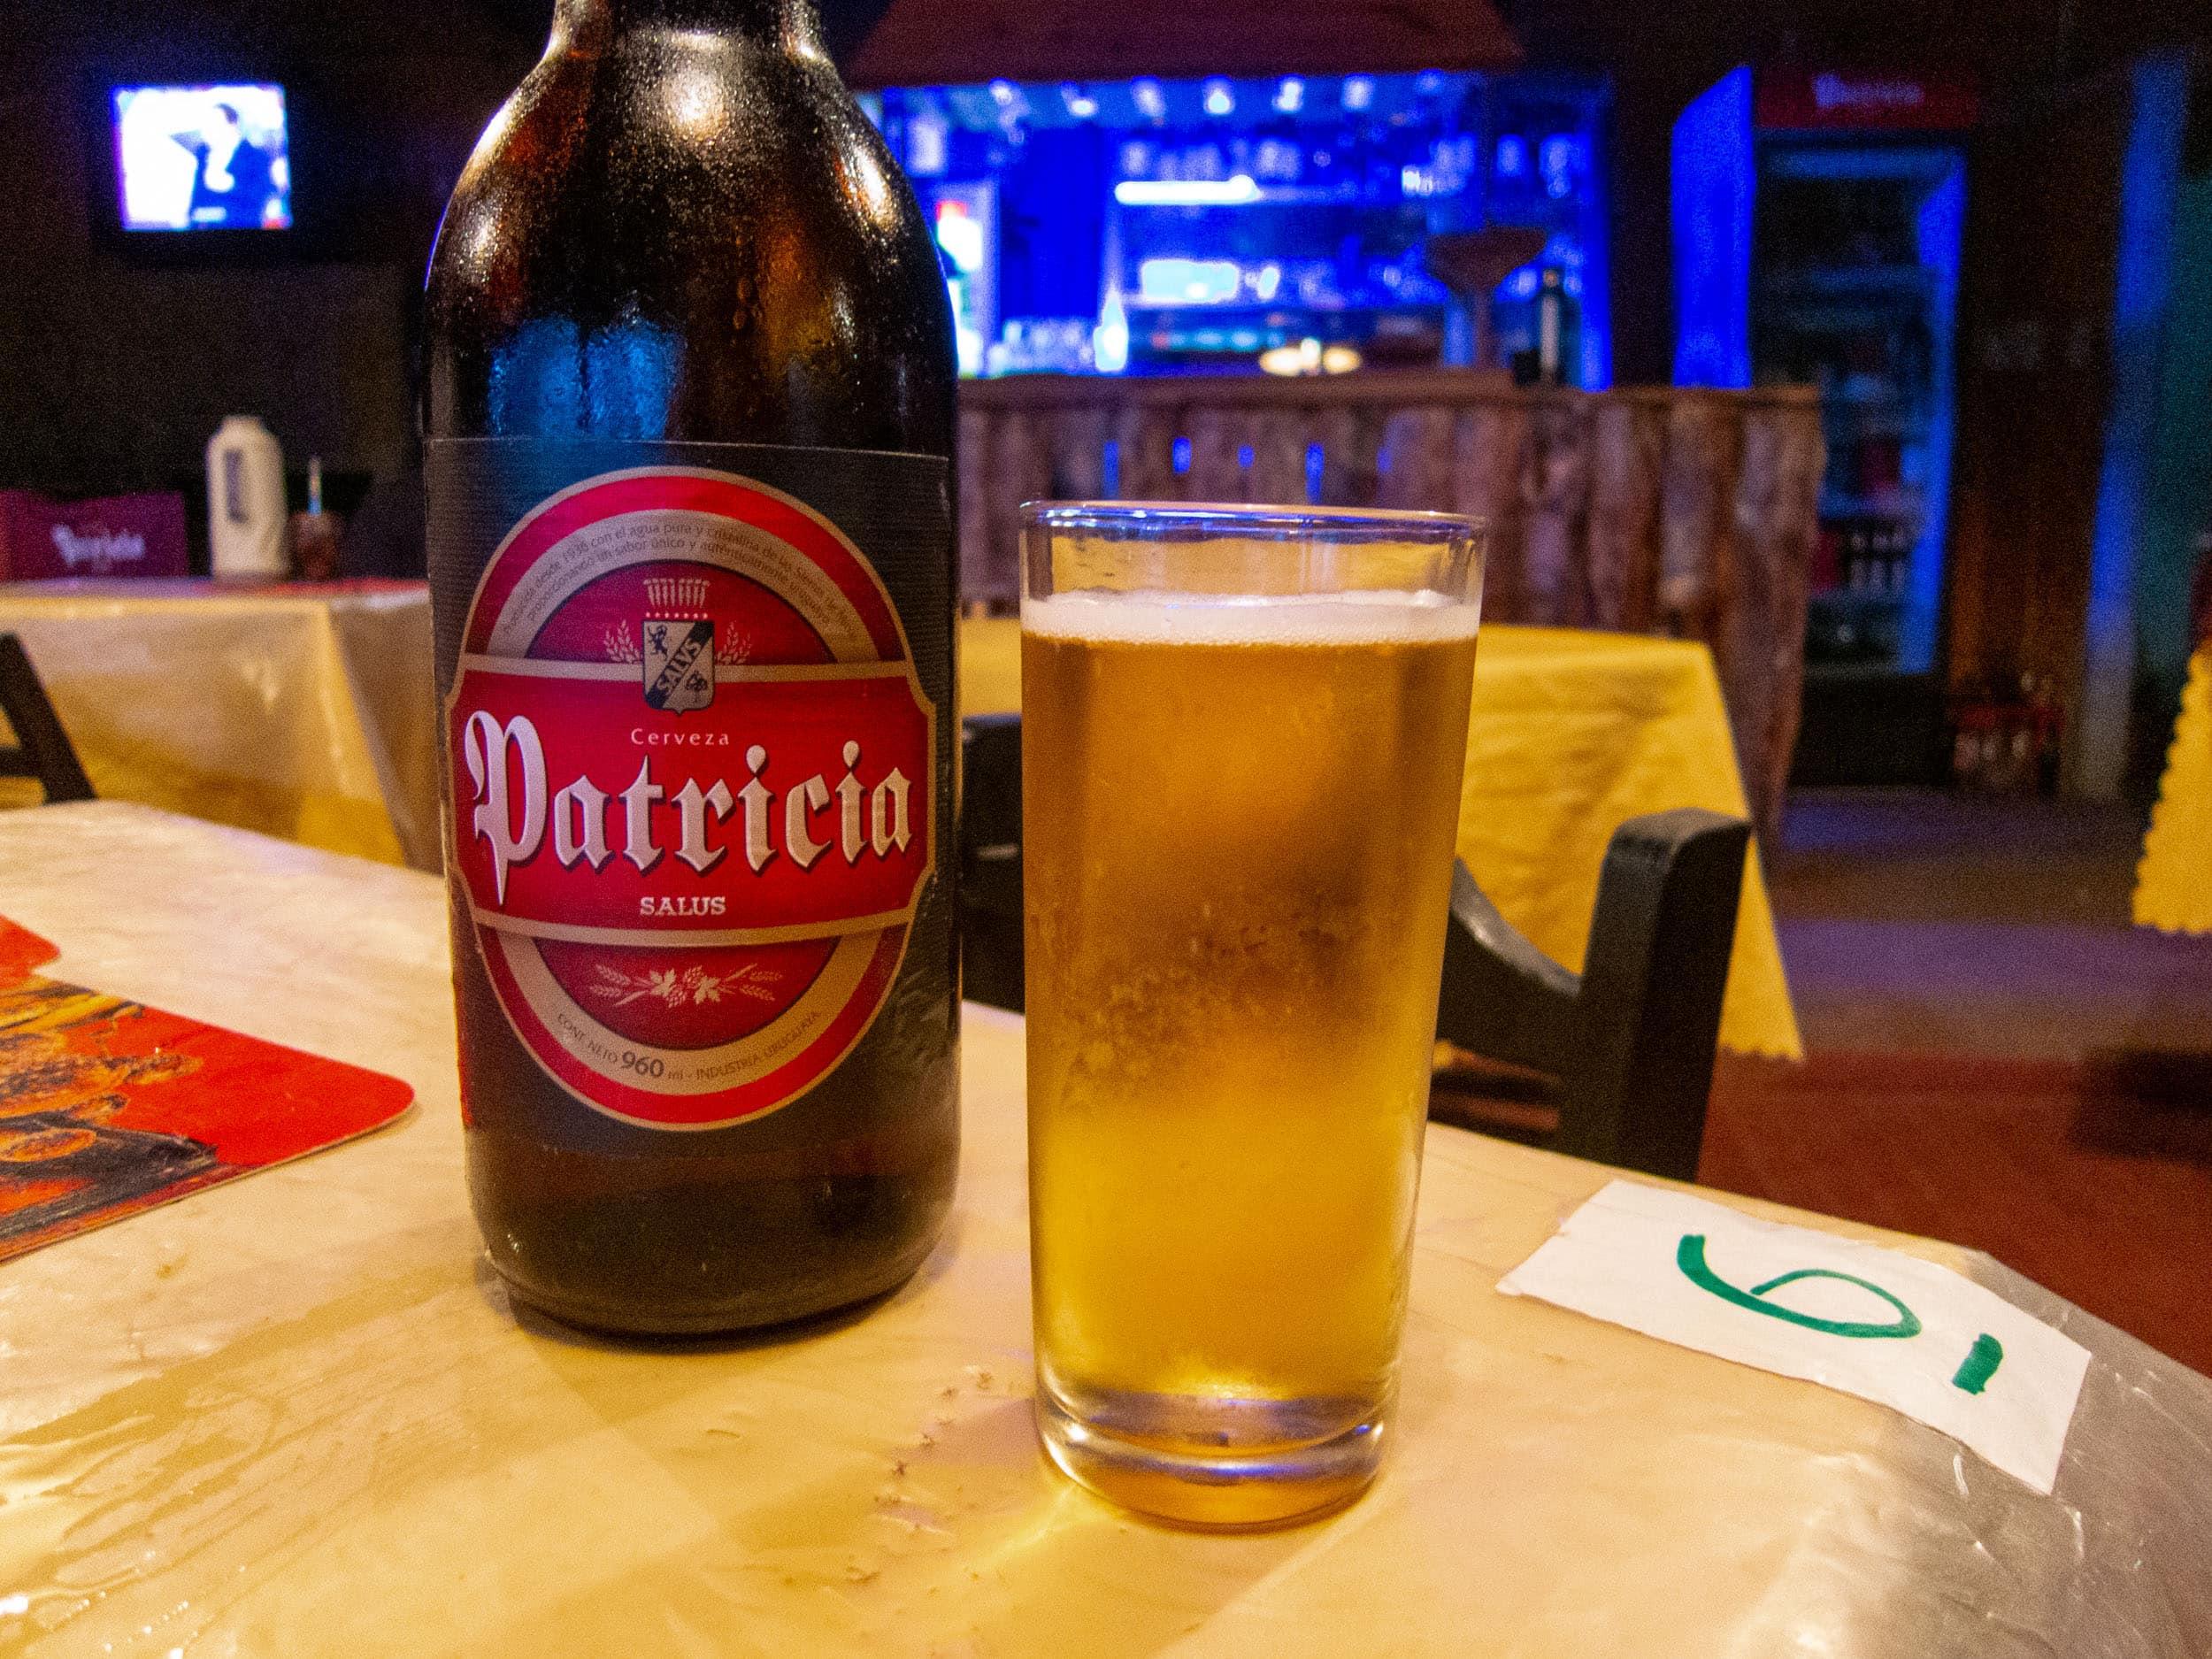 1-liter bottle of Patricia